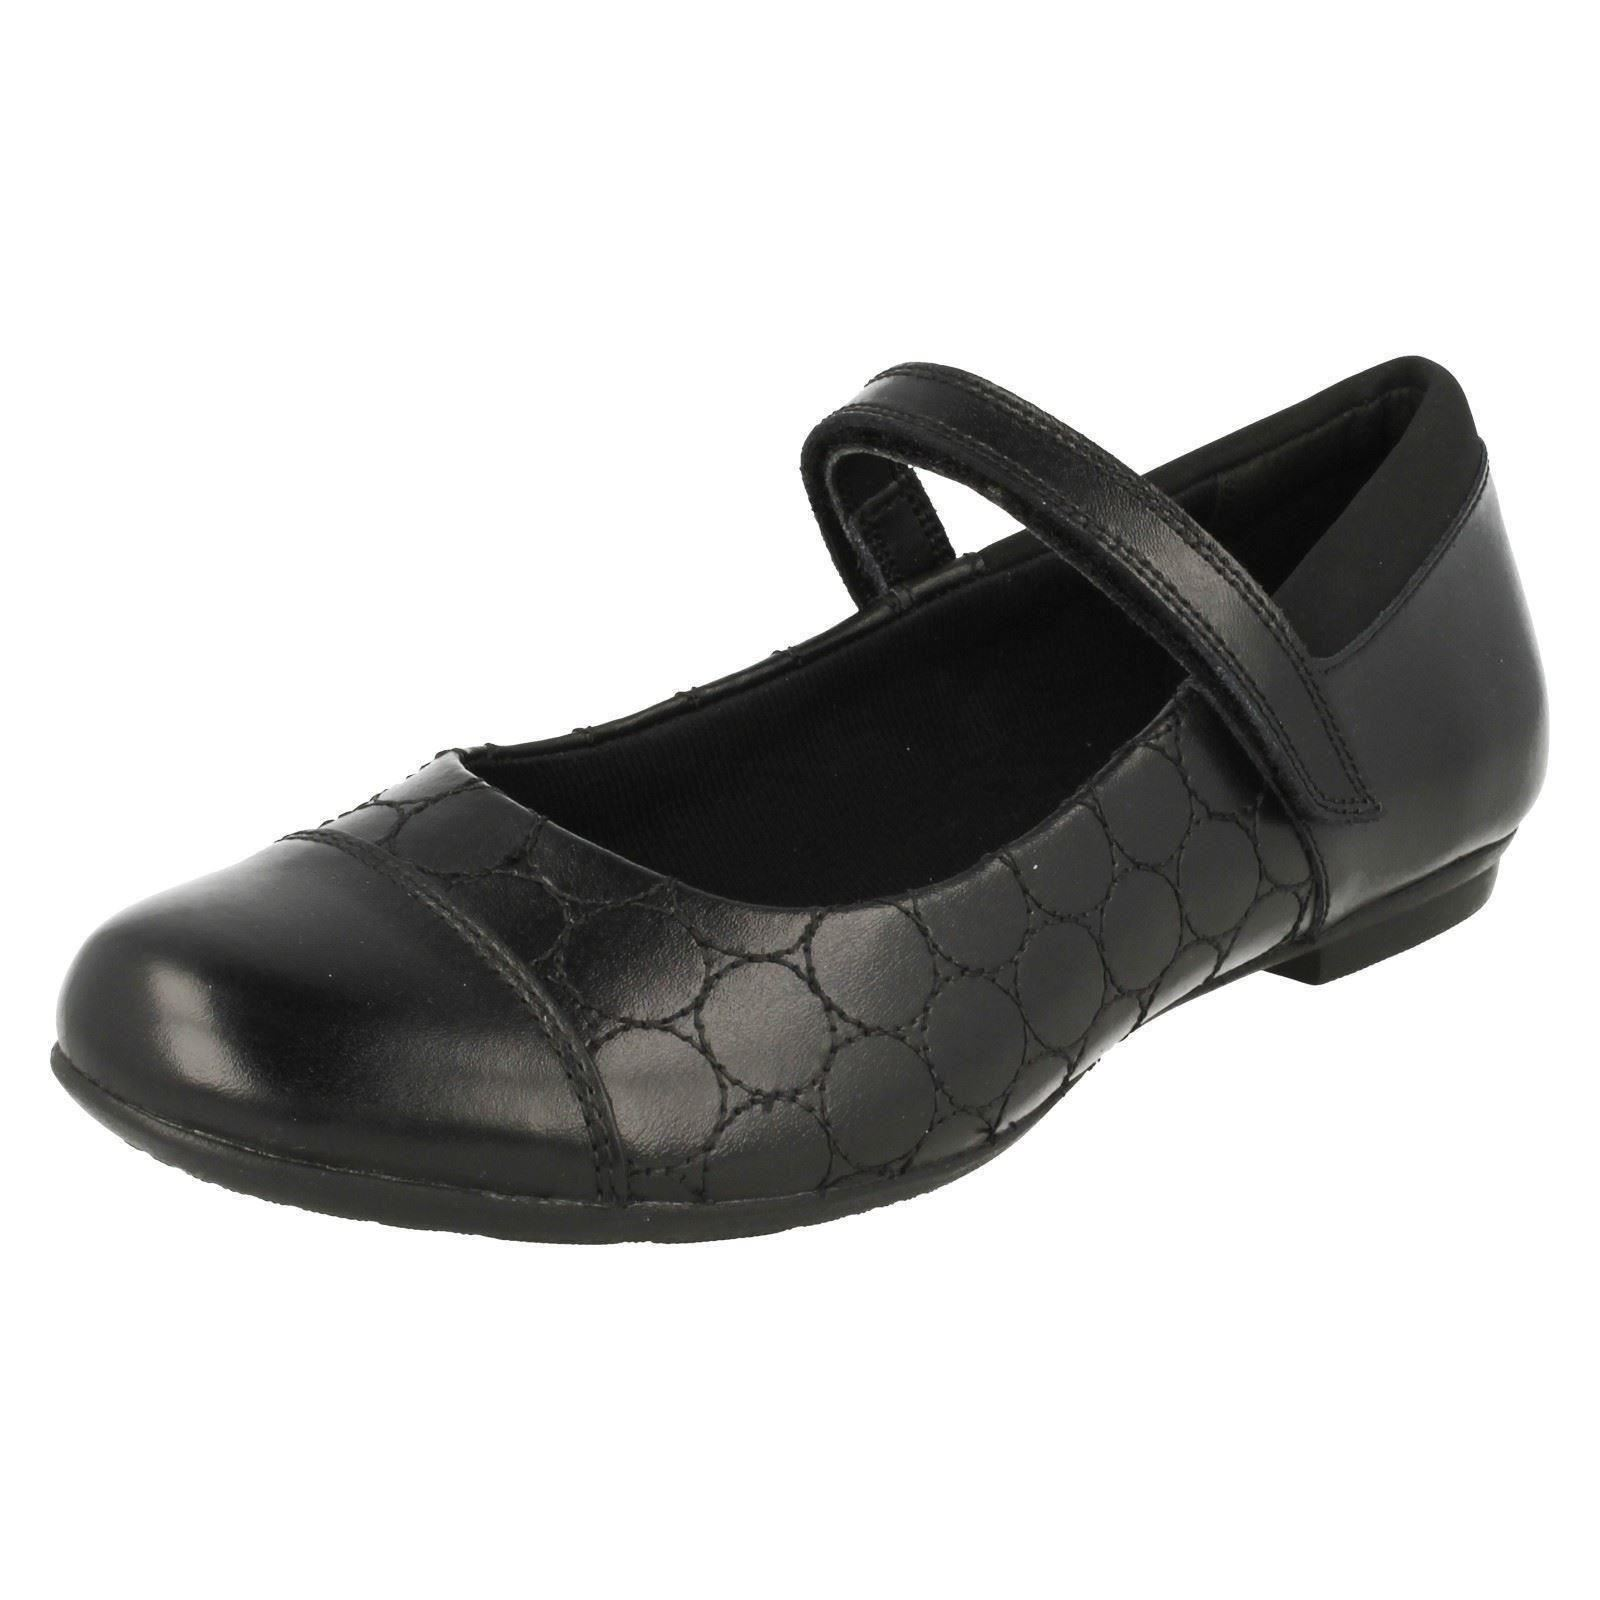 Girls Bootleg by Clarks Smart//Formal School Shoes *Tizz Whizz*